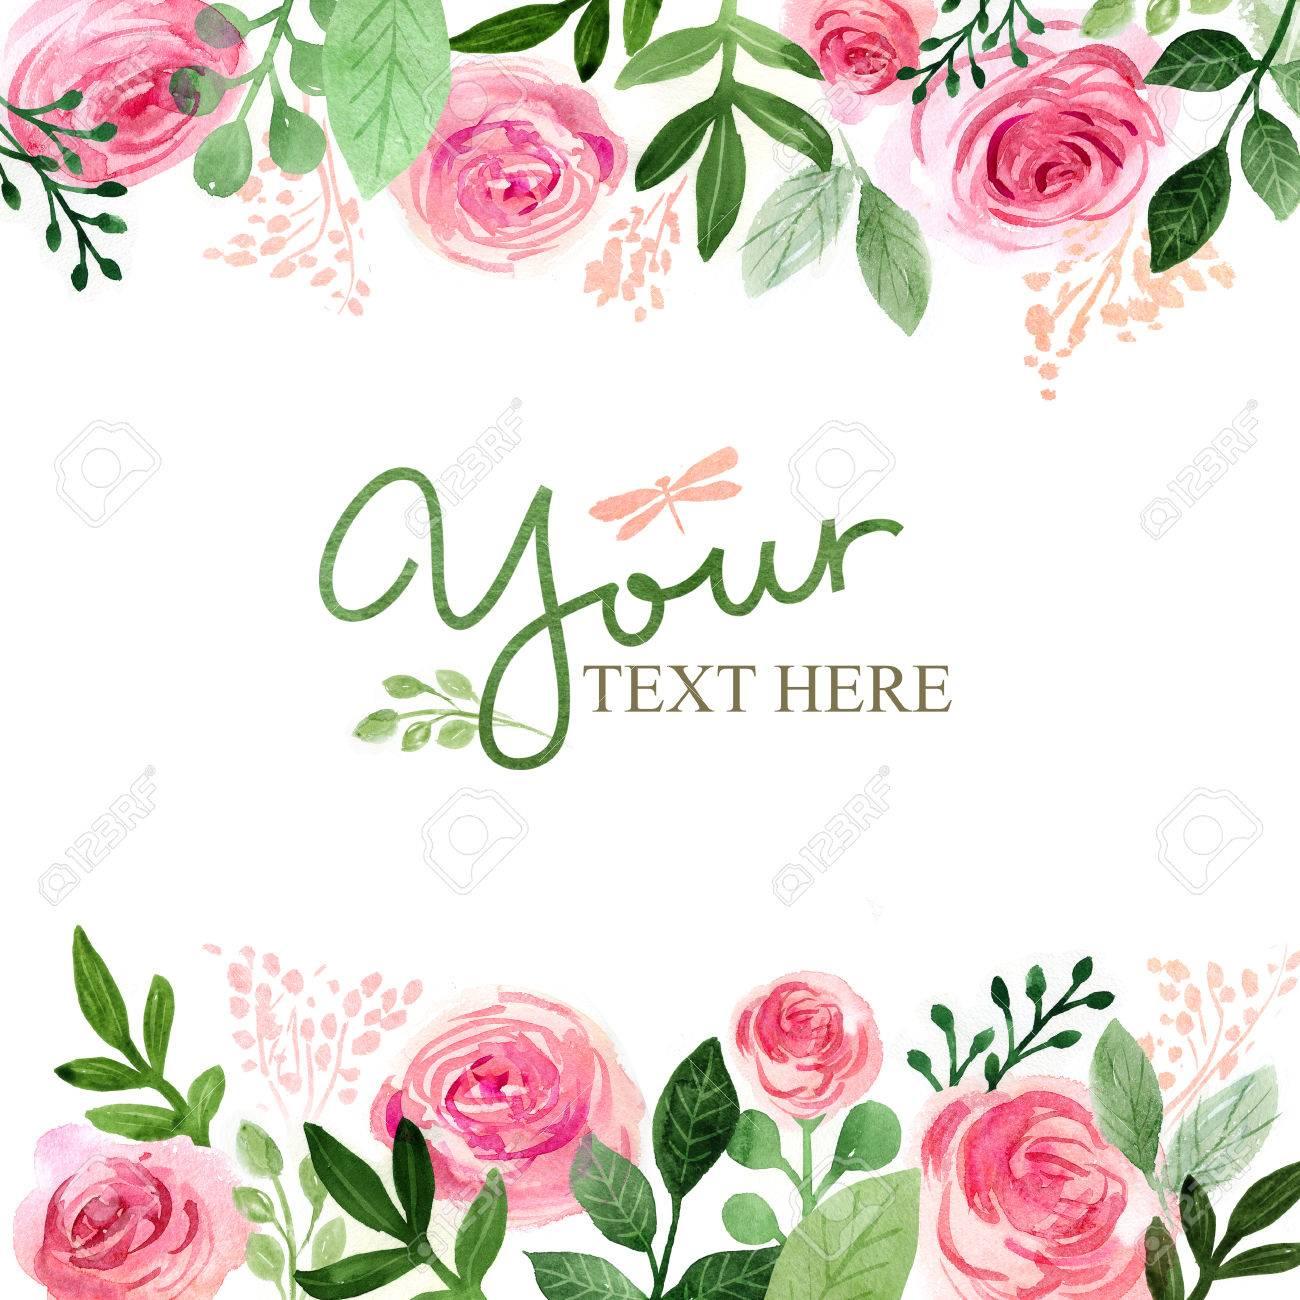 Watercolor floral greeting card. Flowers roses. Handmade. Vintage background - 65587970